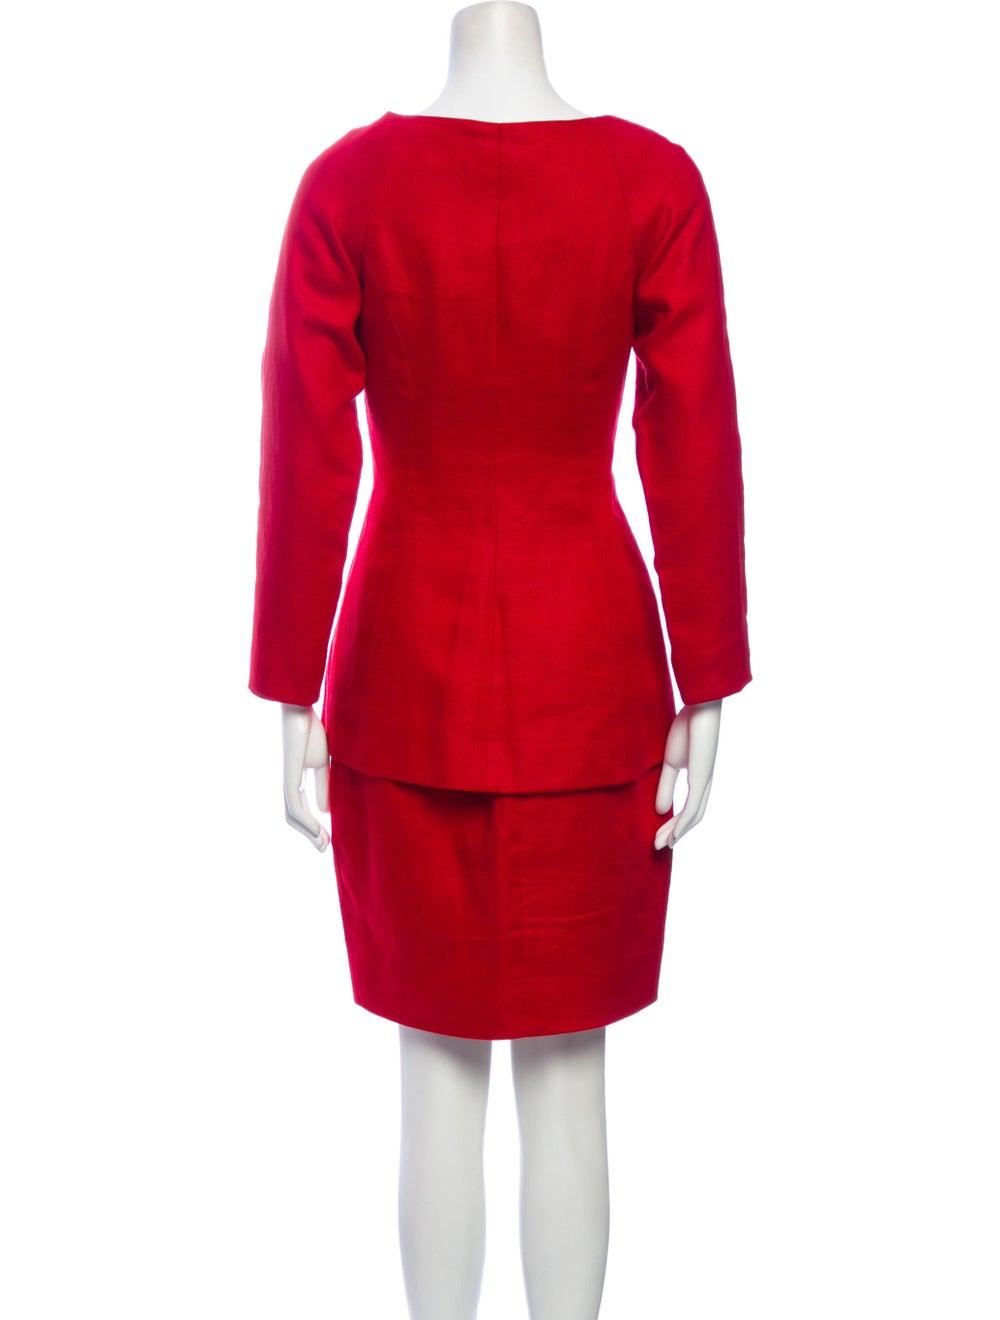 Michael Kors Linen Skirt Suit Red - image 3